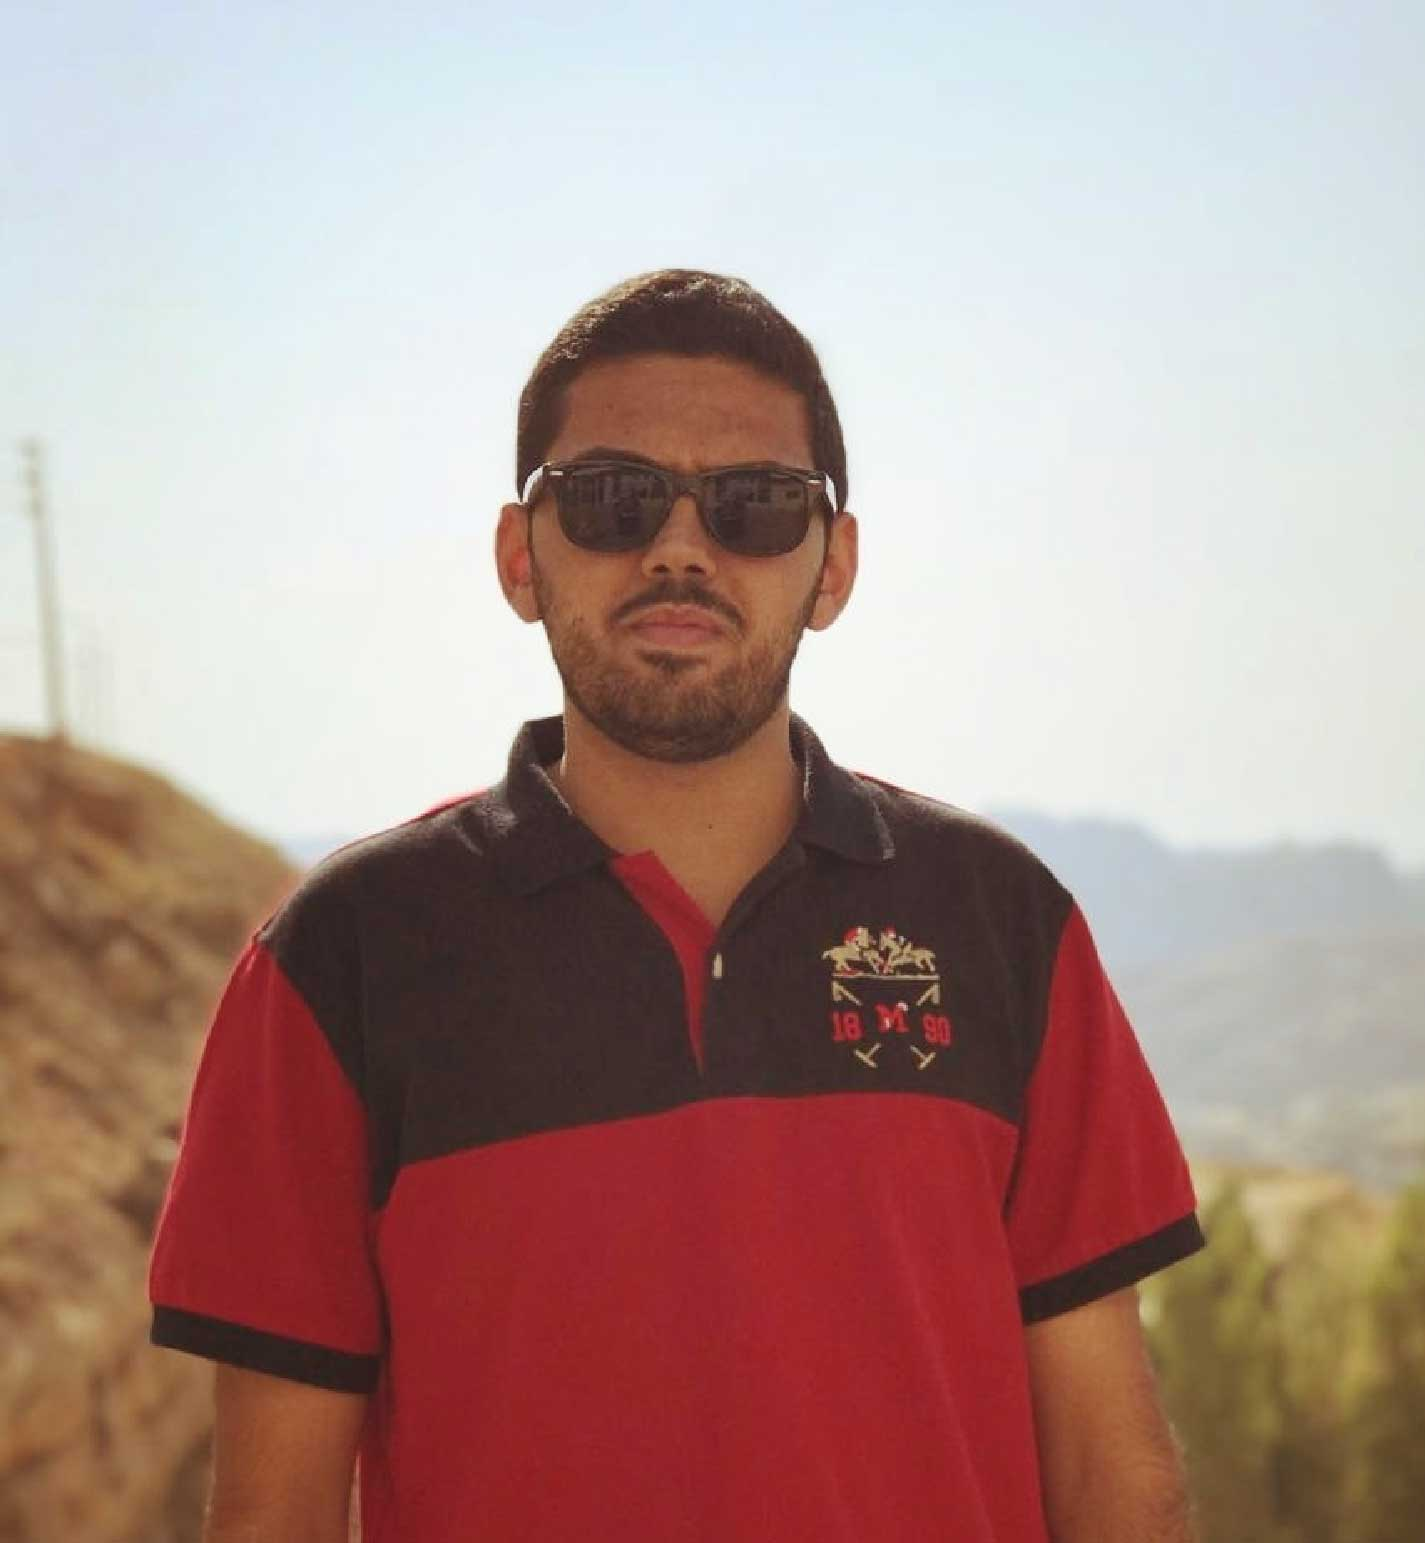 Abdullah Aldaour